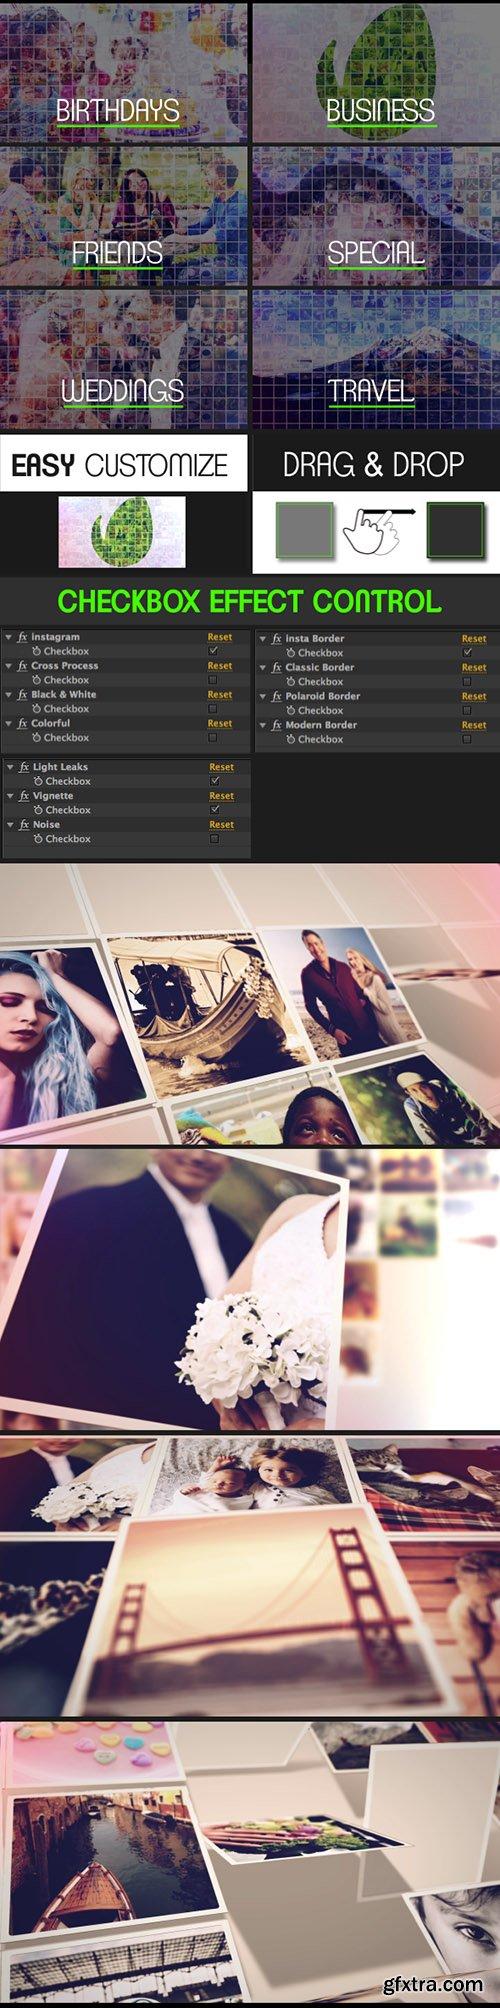 Videohive Revolve Photos Slideshow 11419150